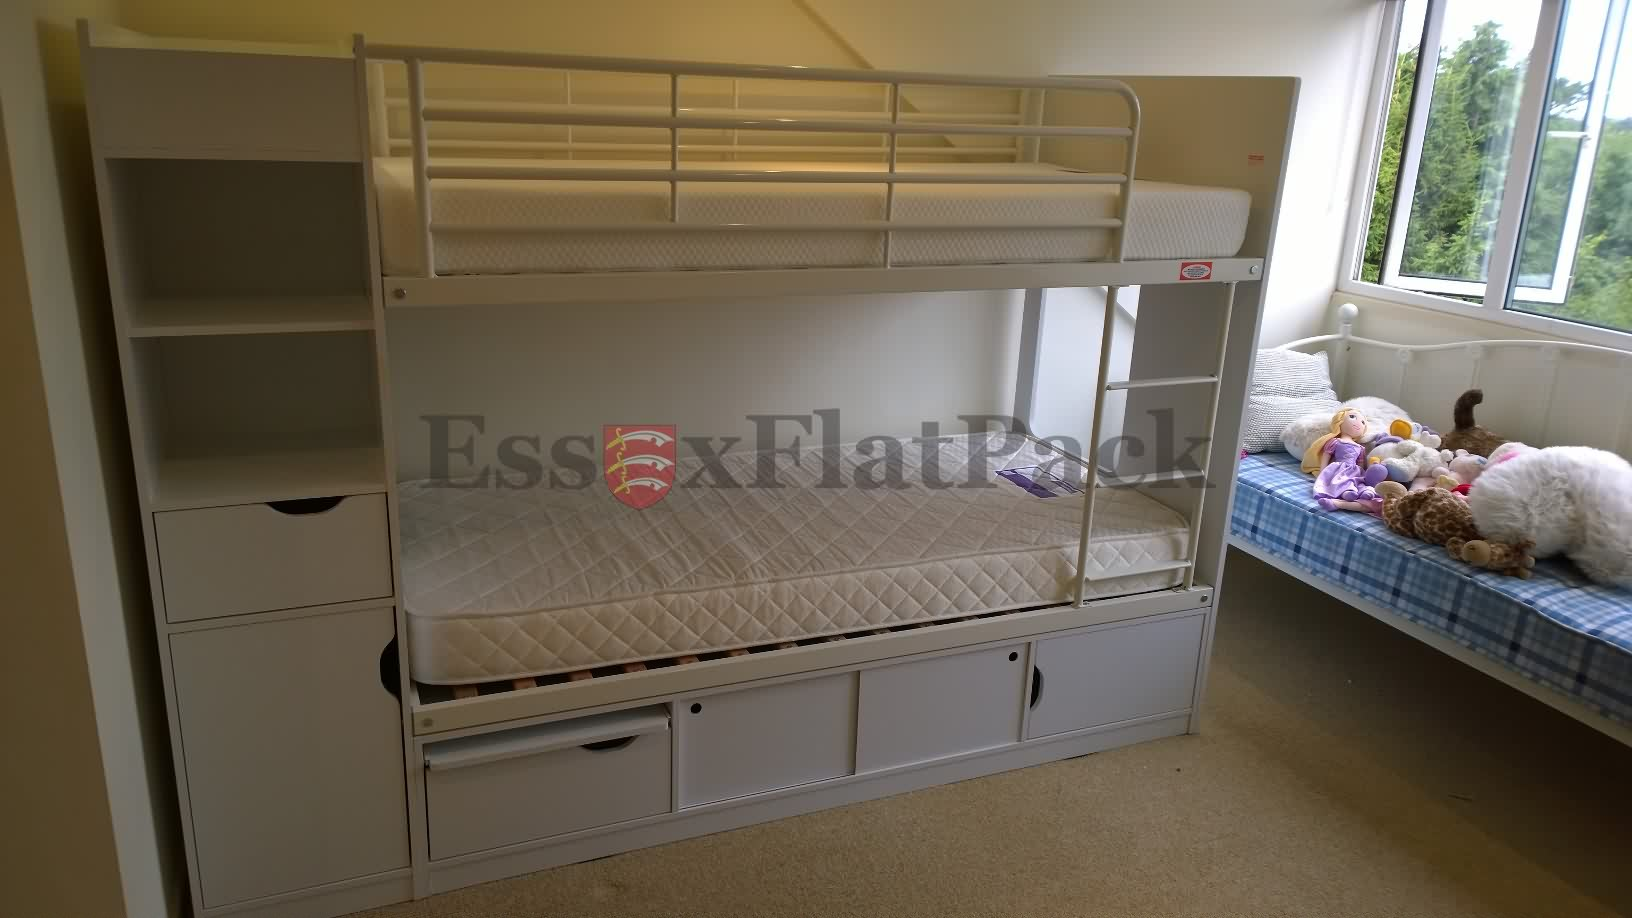 essexflatpack-cabin-bunks-20150727161549.jpg